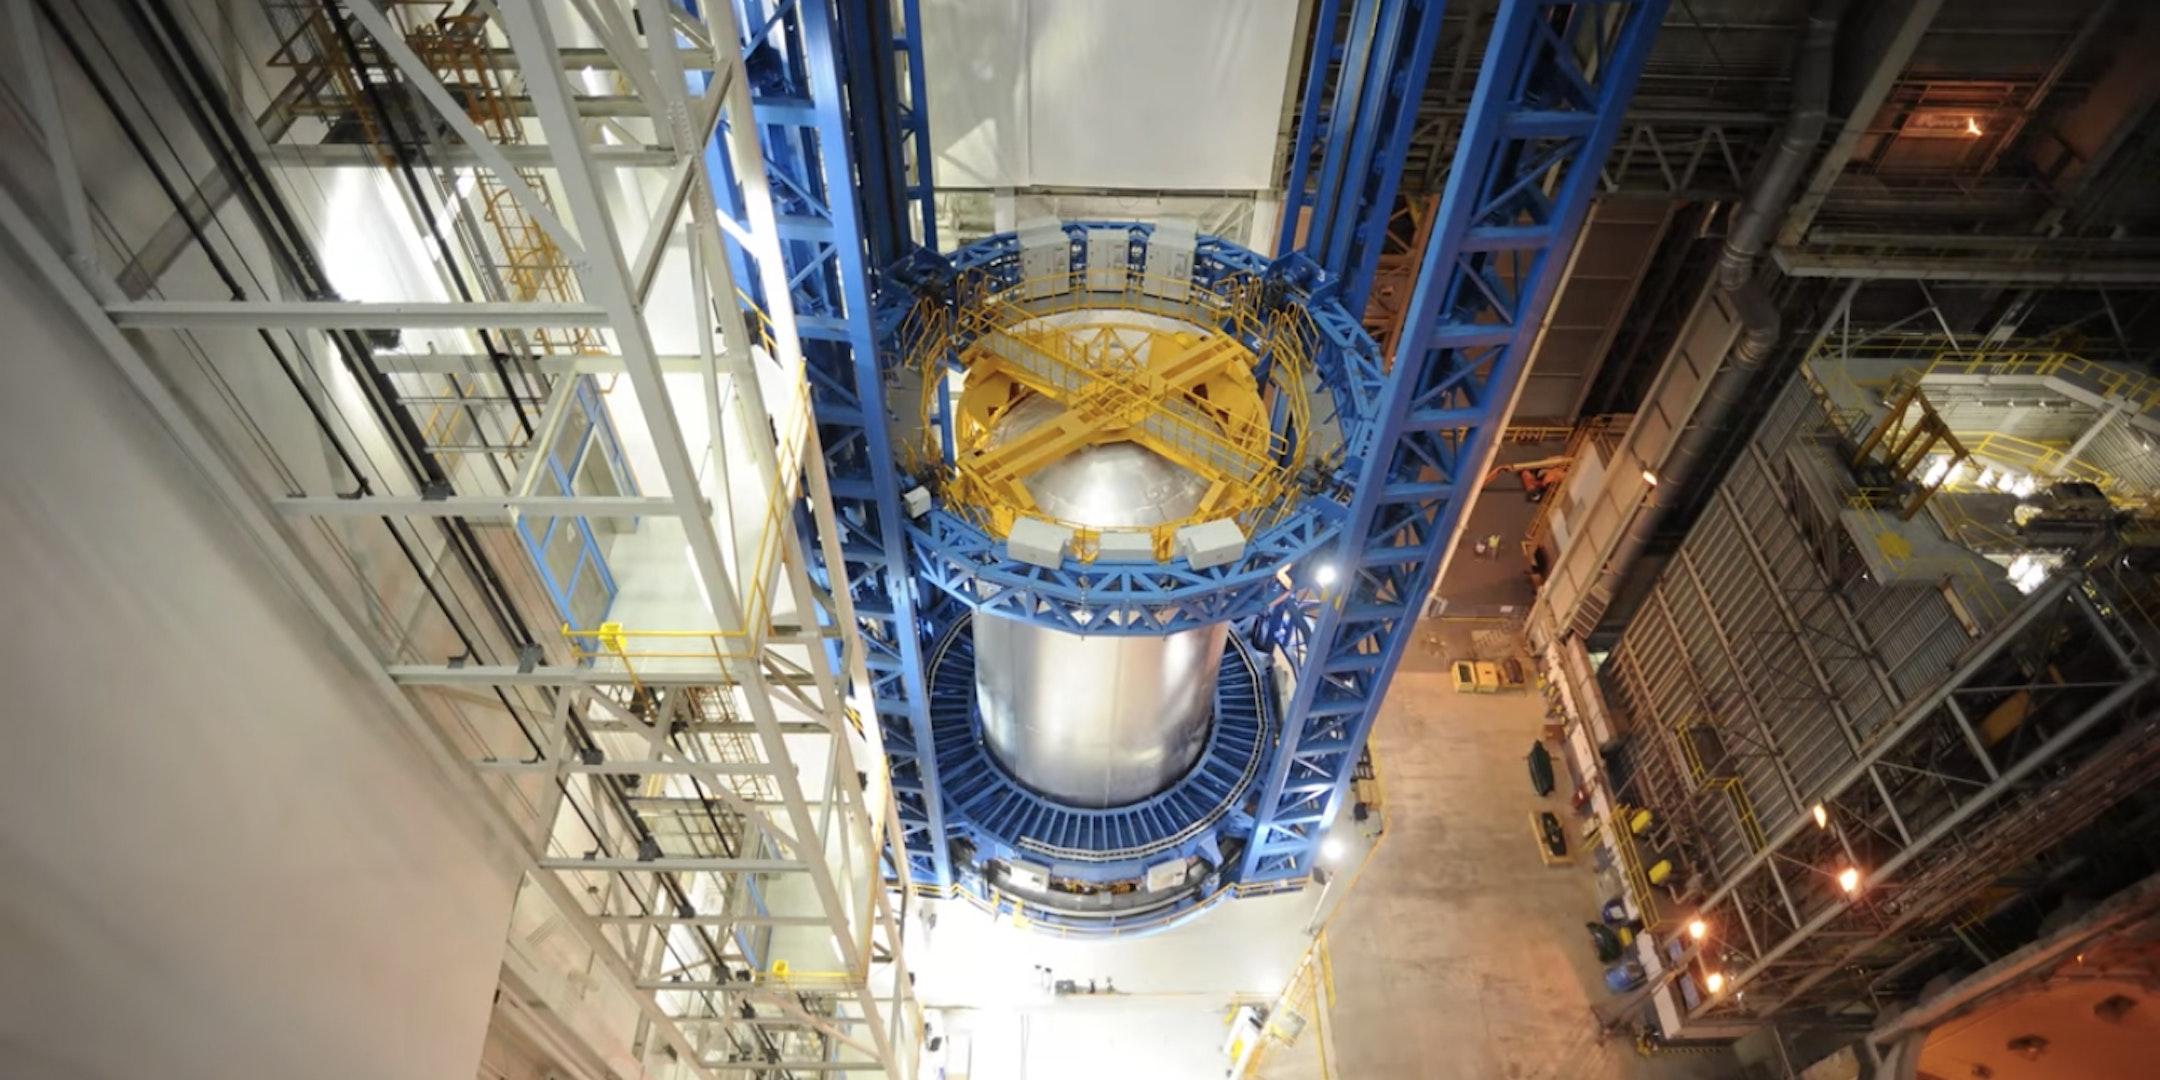 Watch NASA Build a Massive Rocket Fuel Tank in One Minute